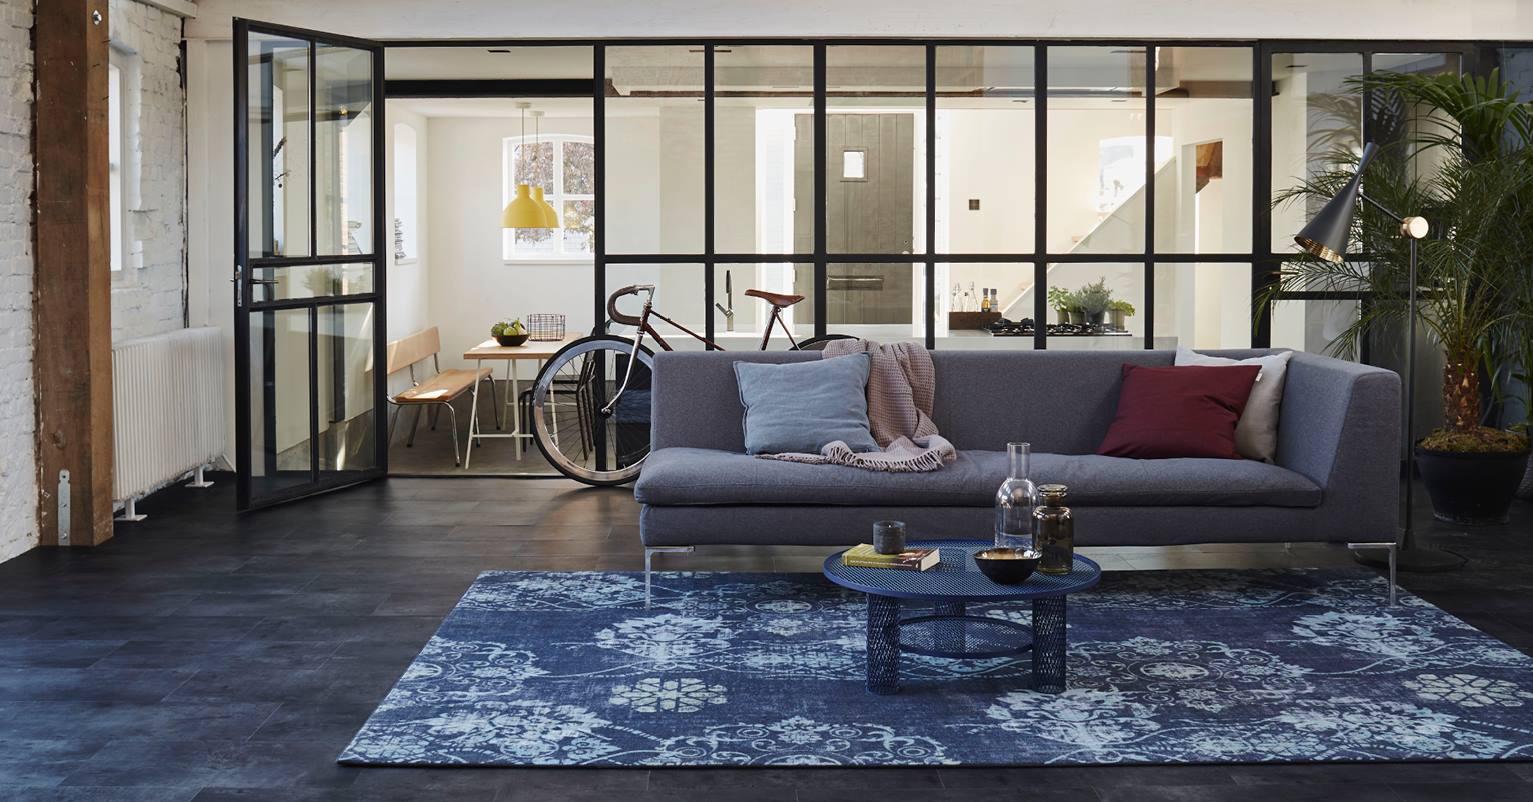 Woonkamer Stijlvol Inrichten : Je woonkamer stijlvol inrichten u woonhome woonhome